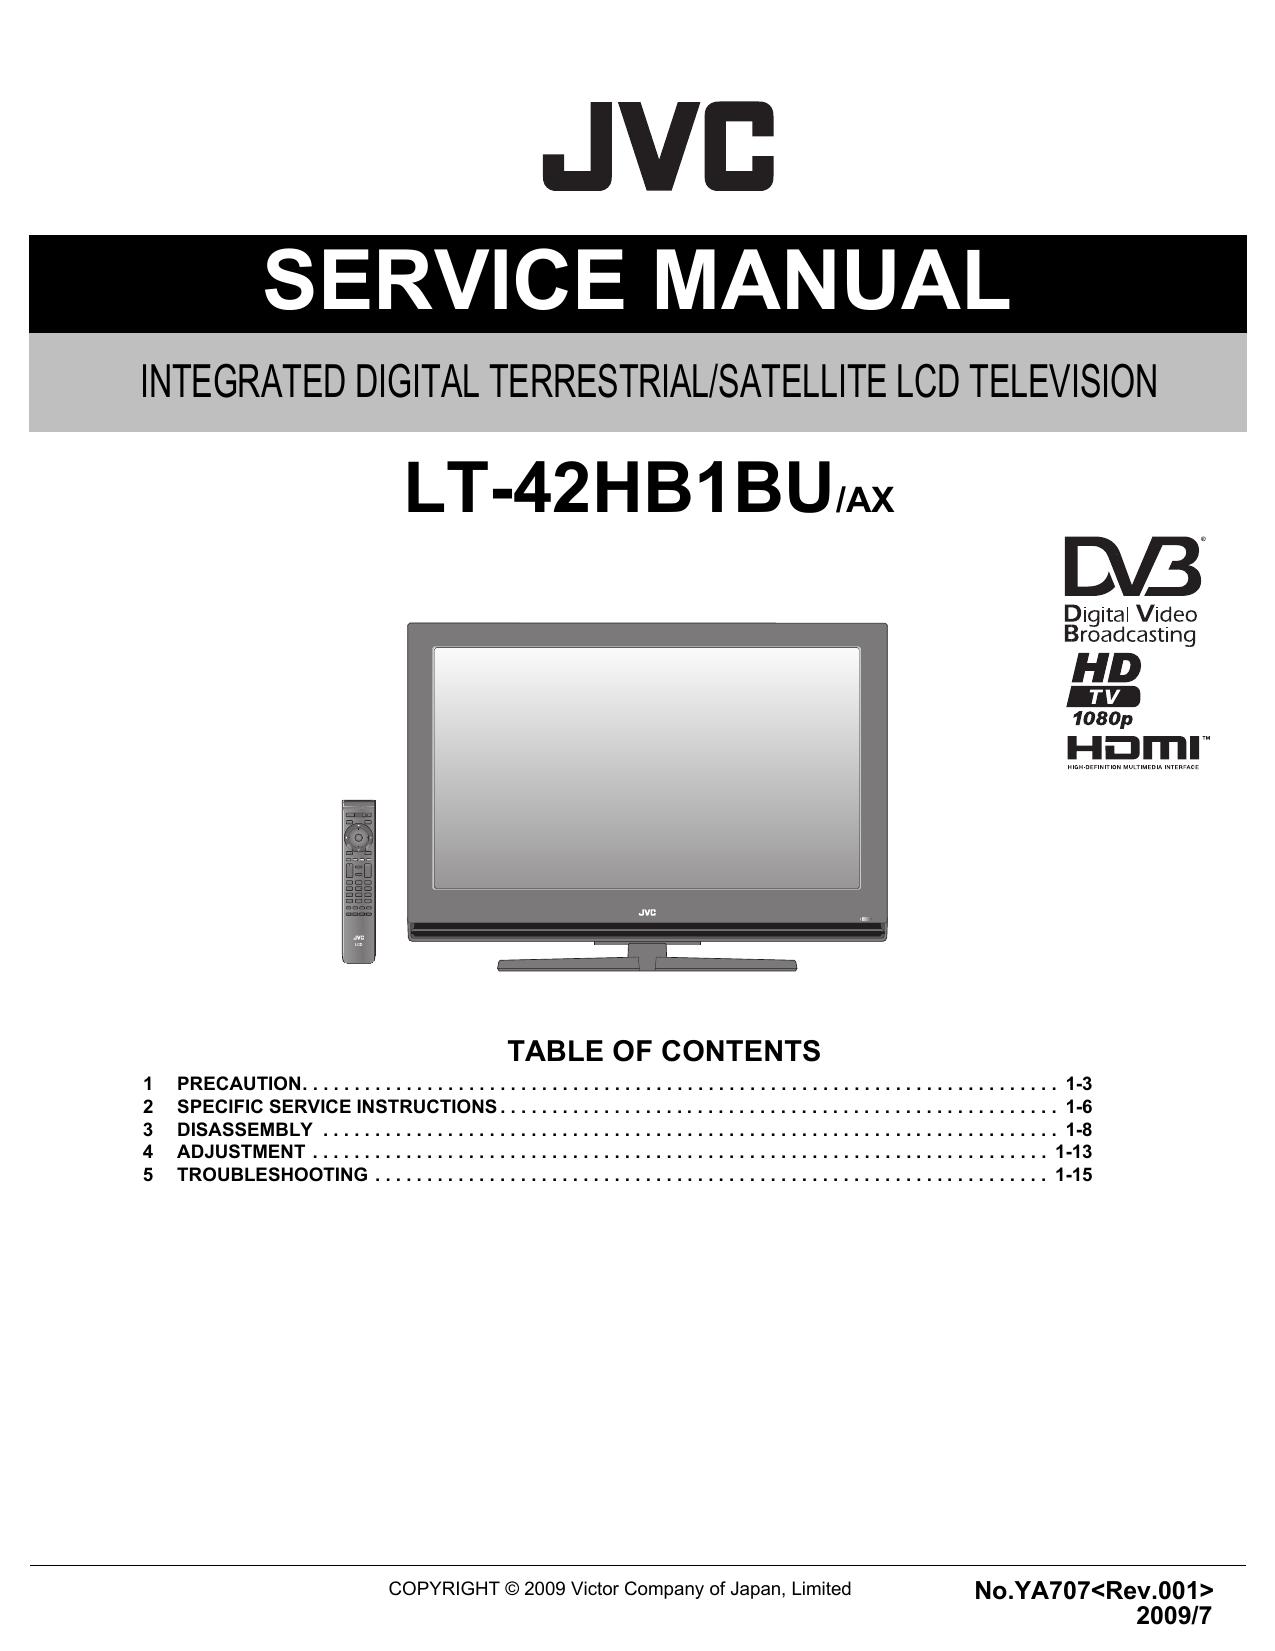 SERVICE MANUAL | manualzz com